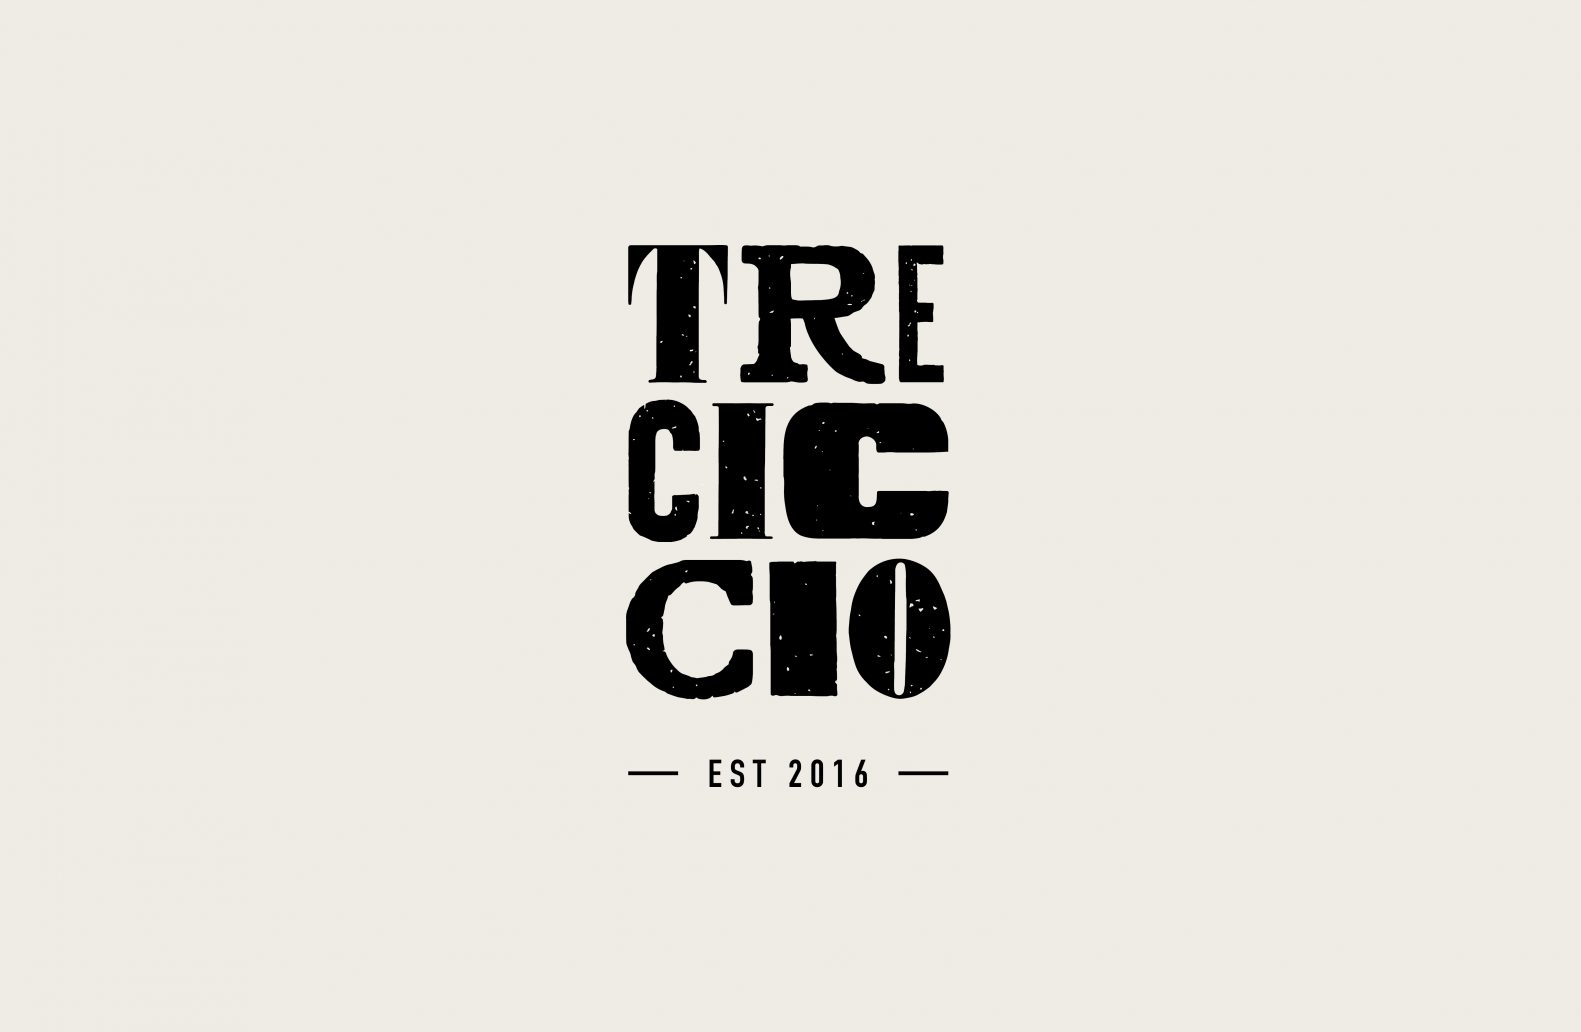 Tre Ciccio Logo Design by Phaus